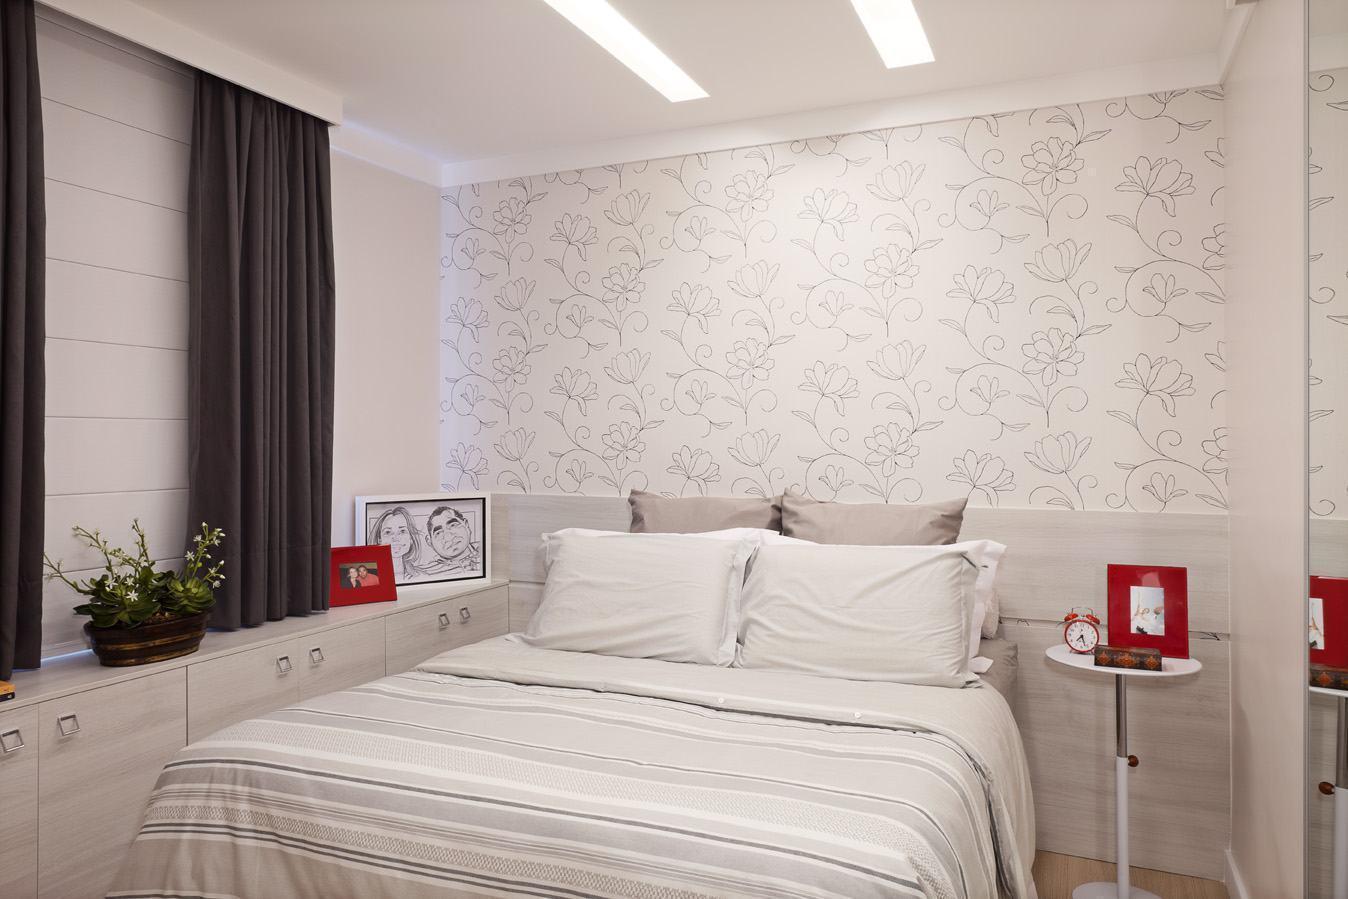 Papel de parede para quarto de casal 60 fotos lindas - Paredes de papel ...